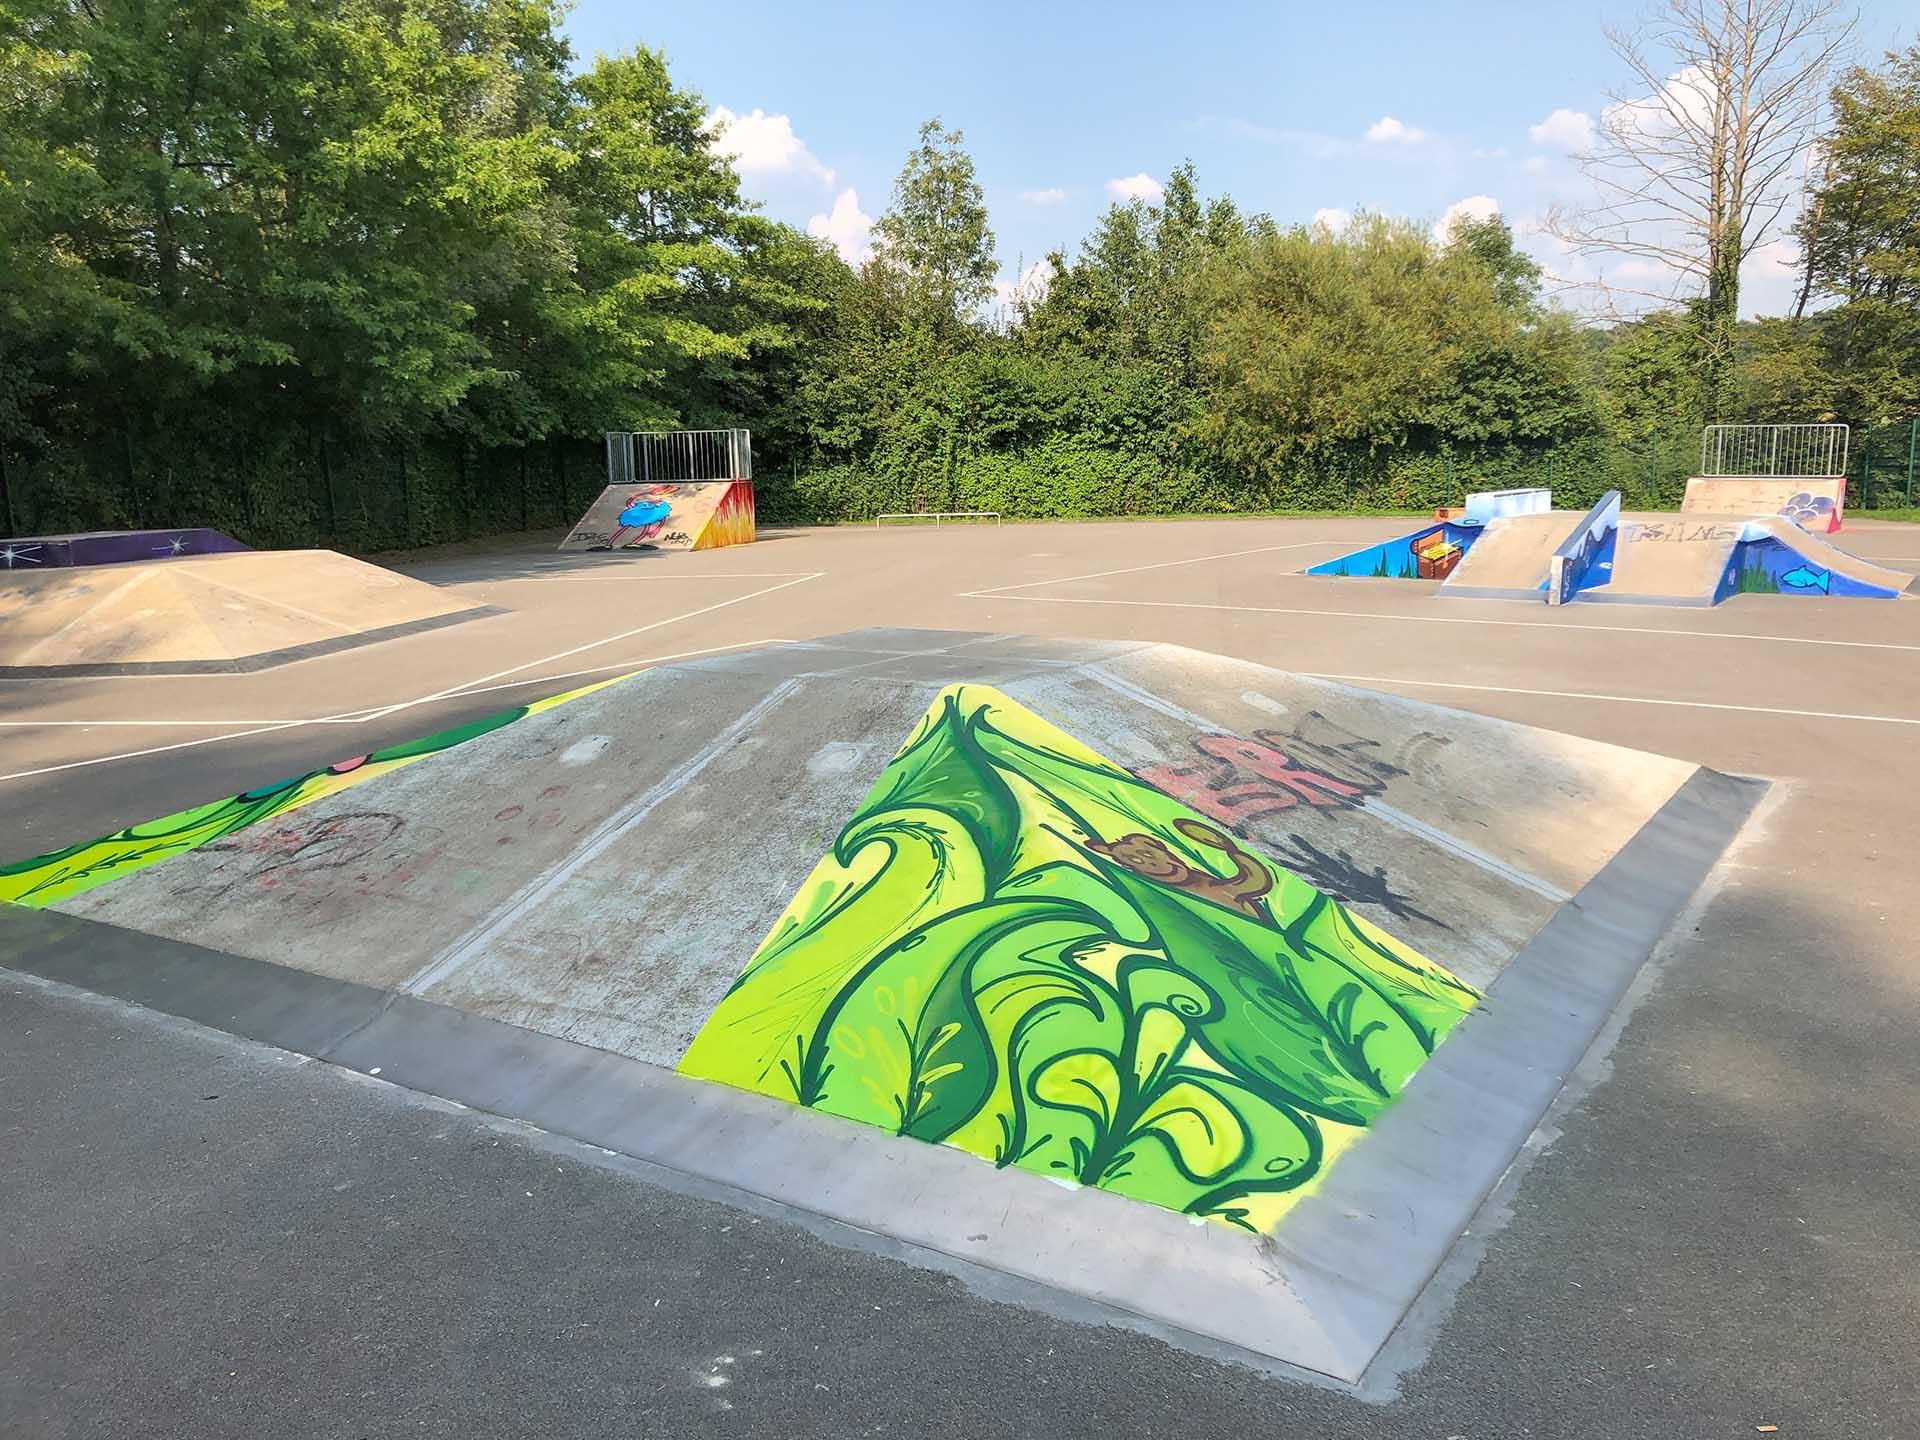 Graffiti-Workshops, Schule, Münster, Graffiti, Workshop, Sprayen, Aktion, Bennet Grüttner